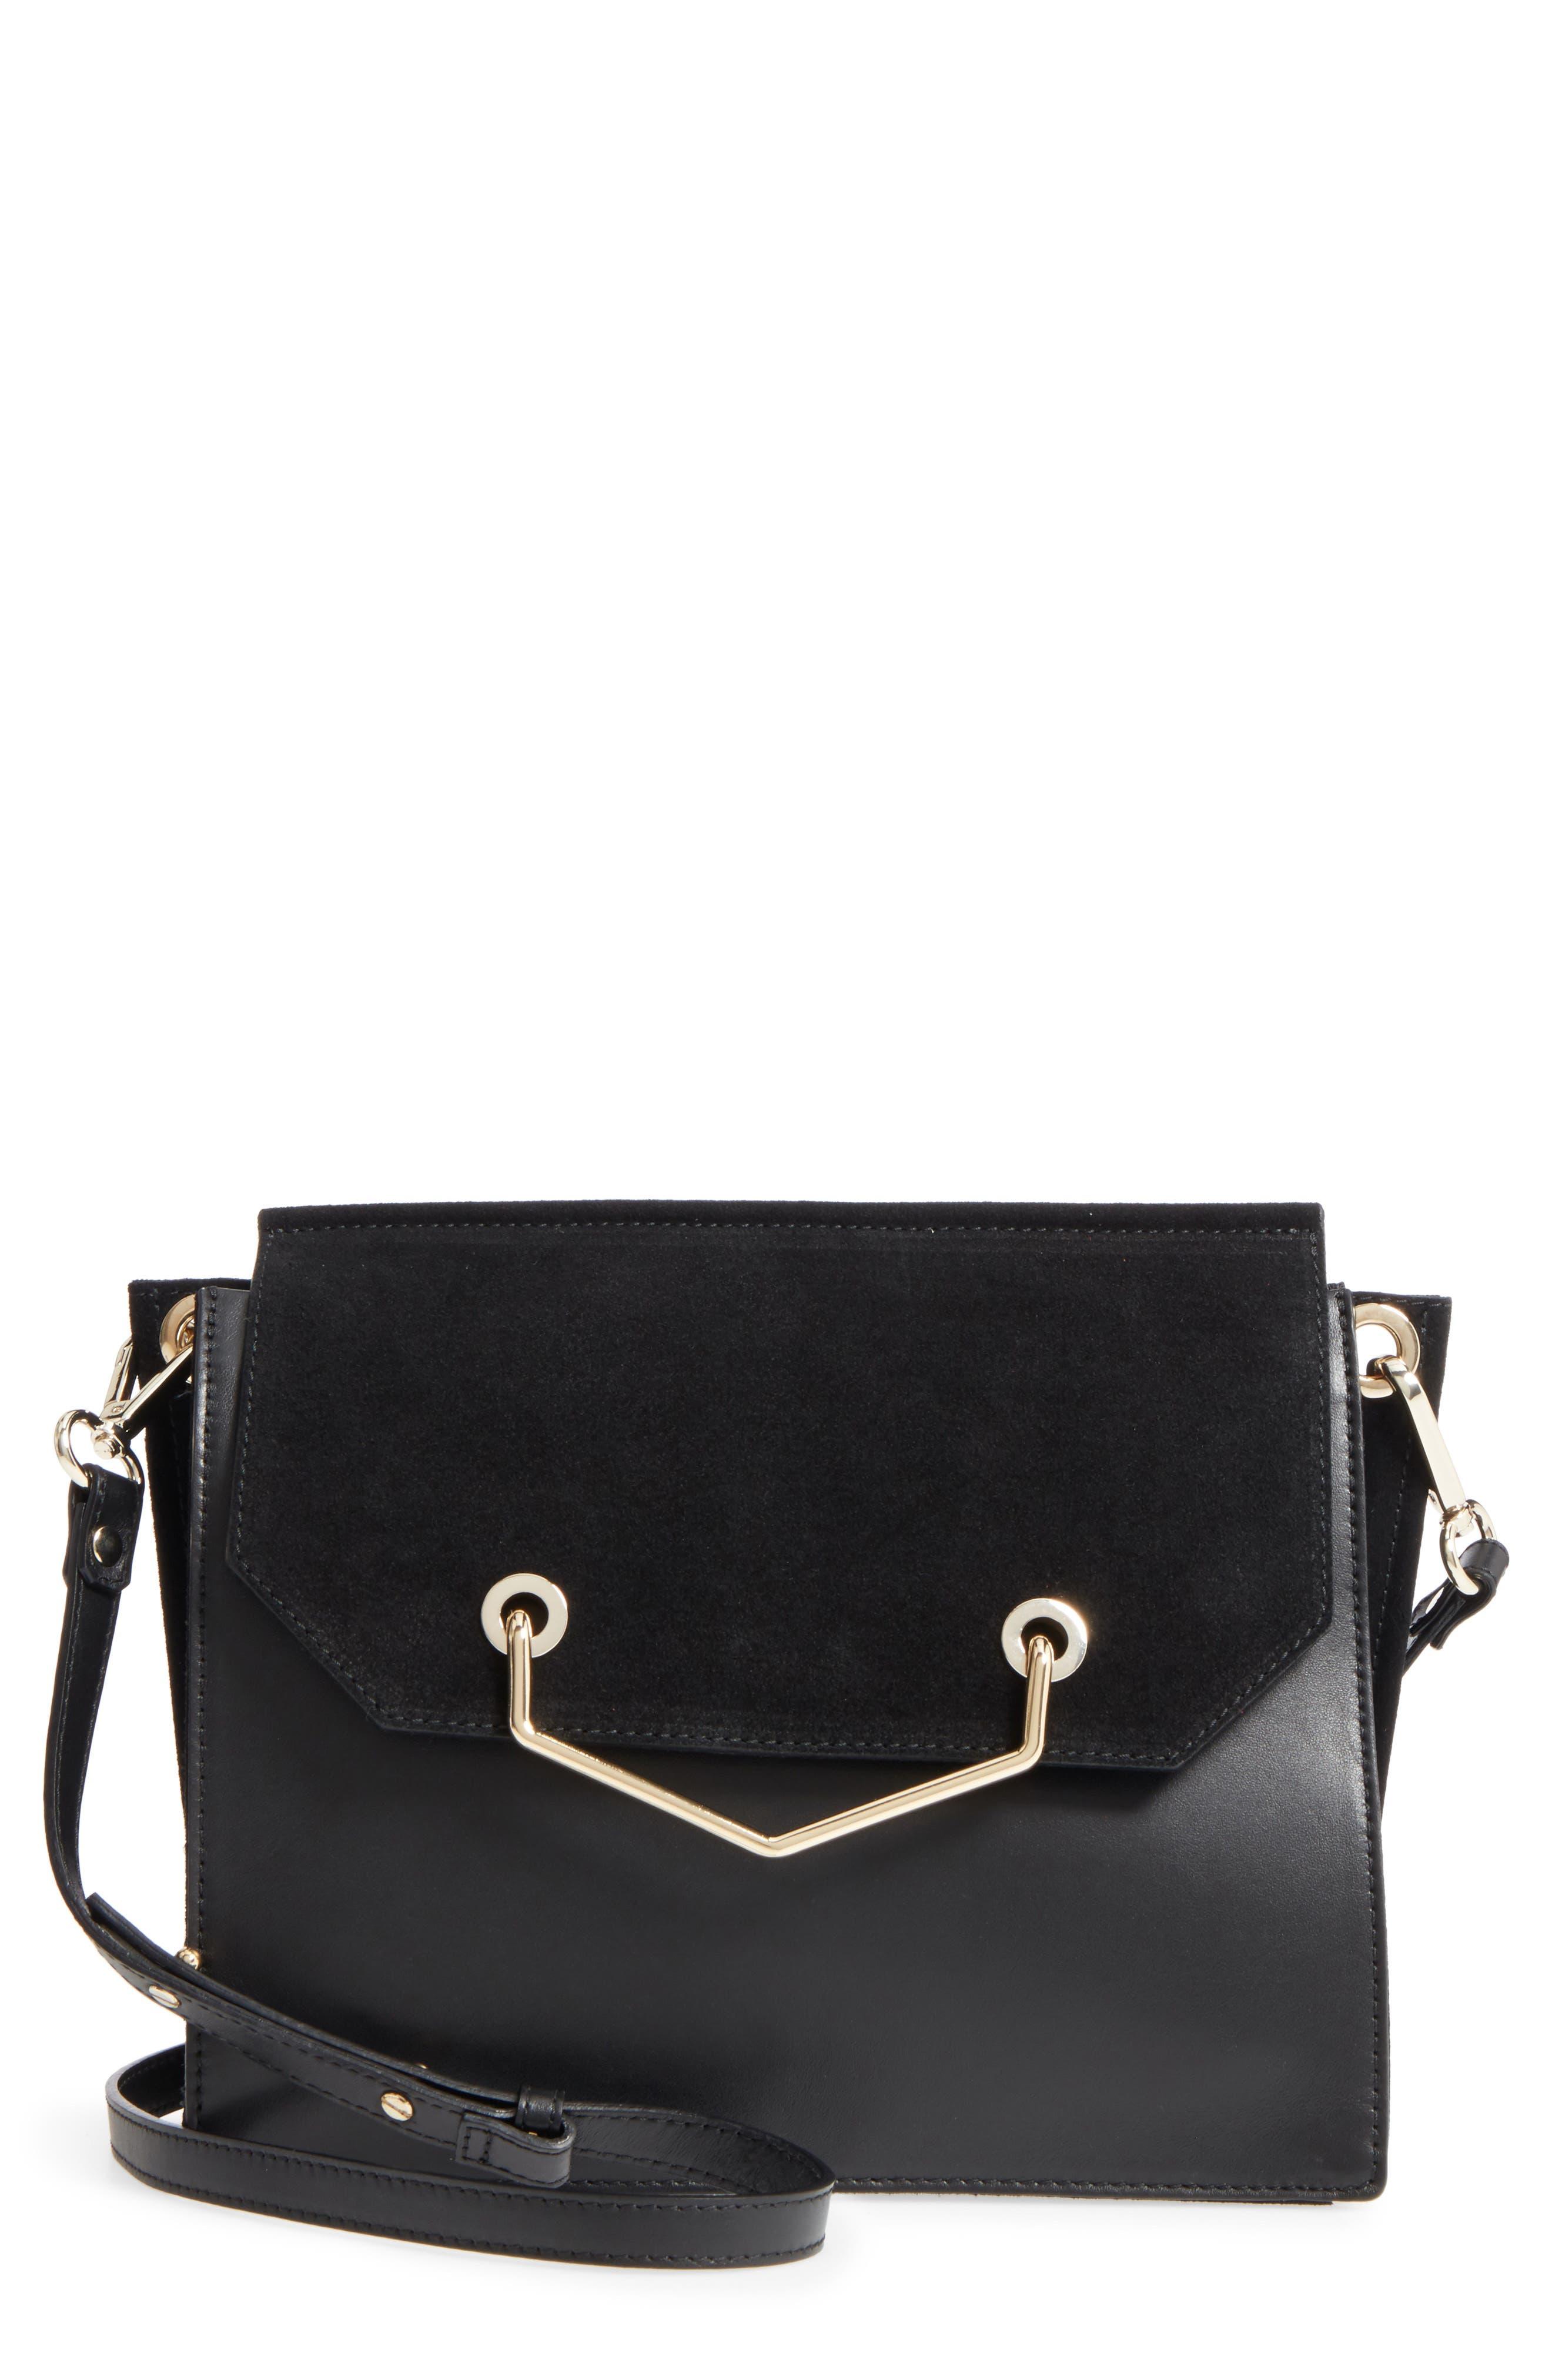 Premium Leather & Suede Soko Shoulder Bag,                         Main,                         color, Black